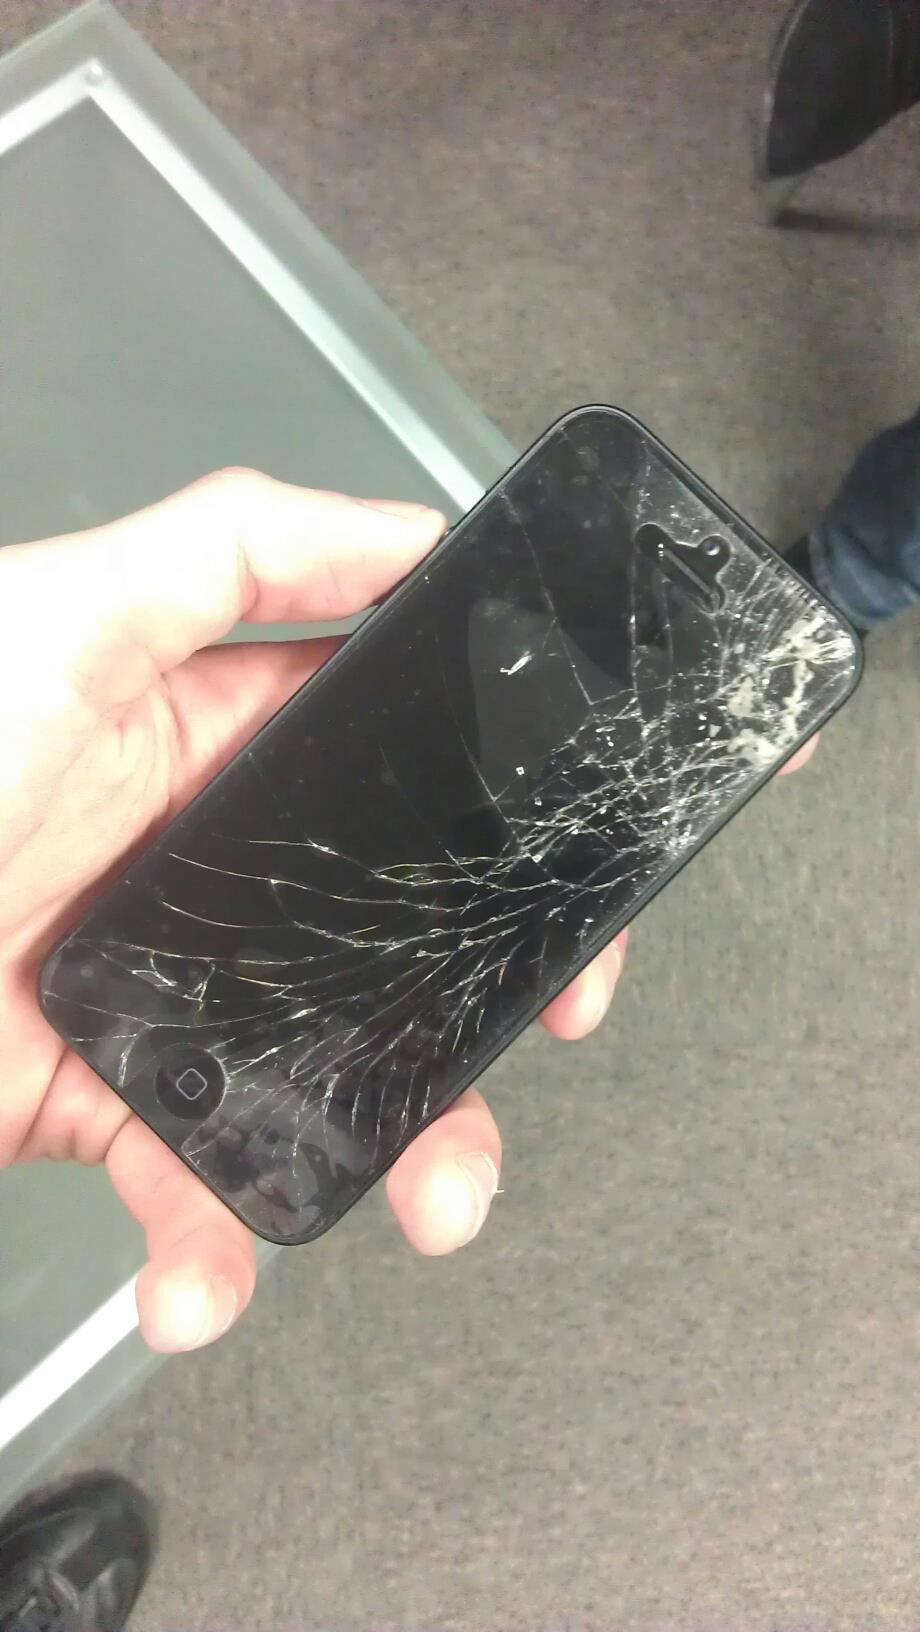 Cum arata un iPhone 5 spart